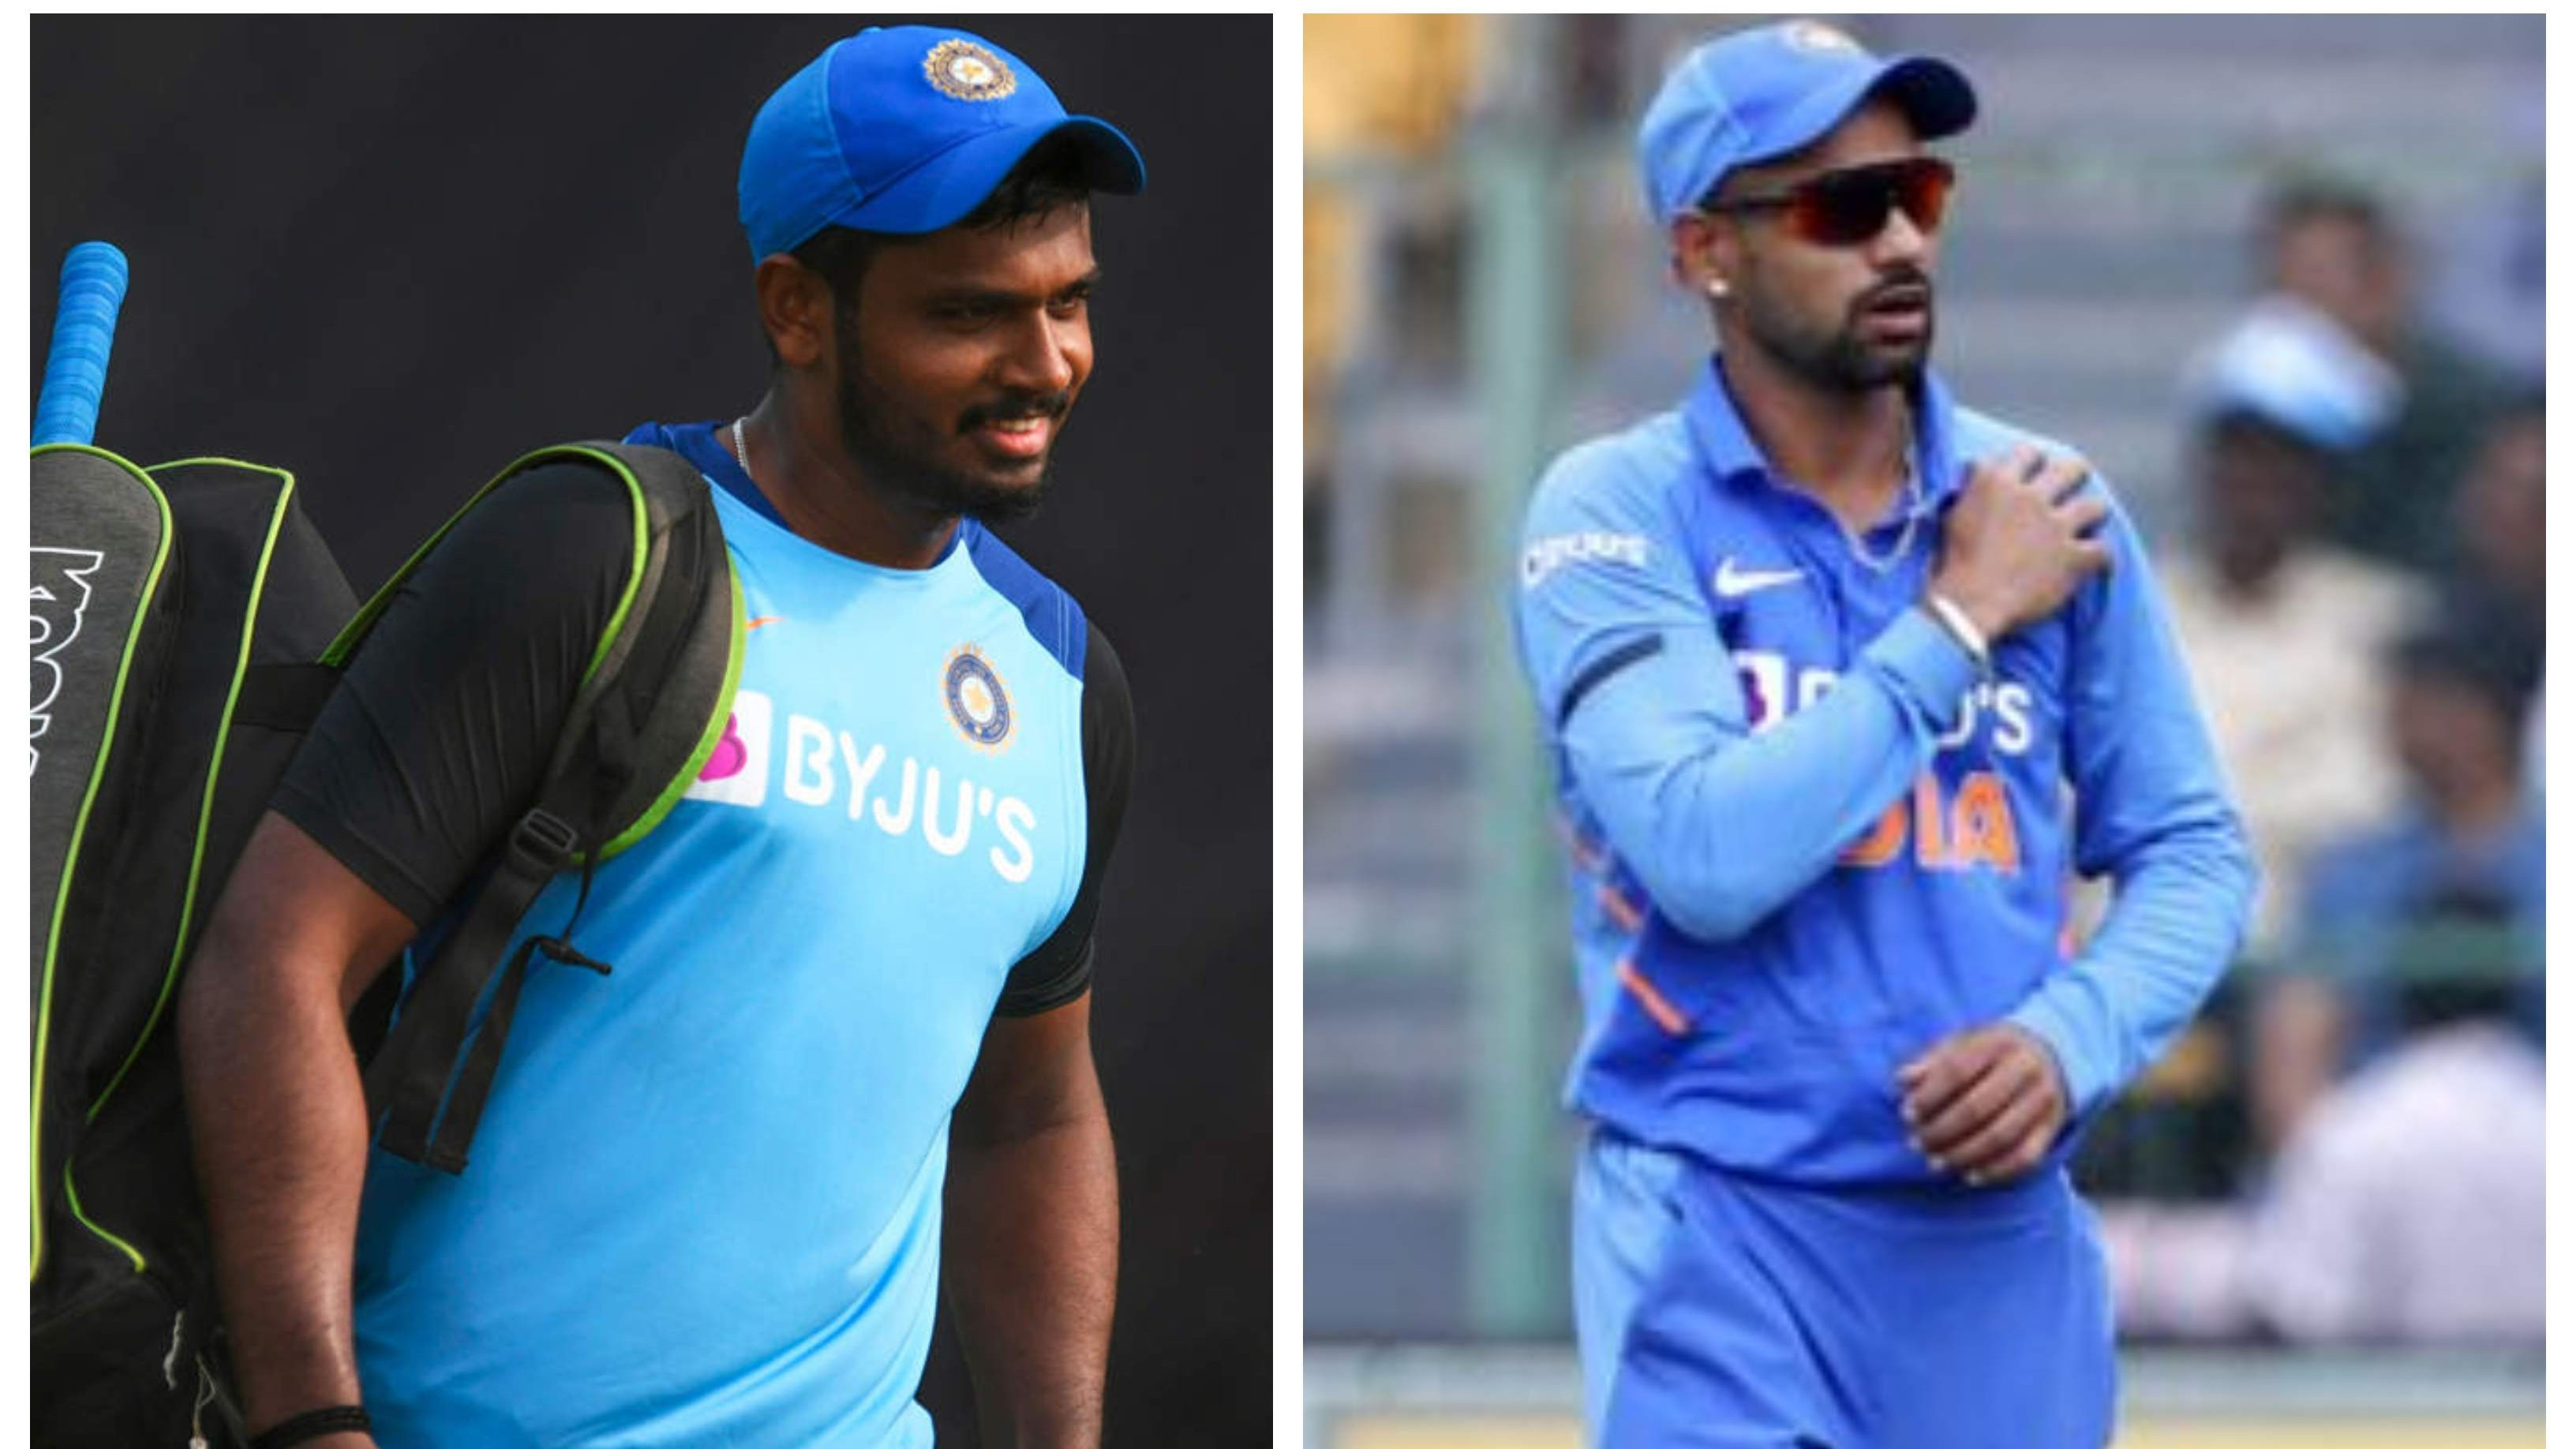 NZ v IND 2020: Sanju Samson replaces injured Shikhar Dhawan in India's T20I squad